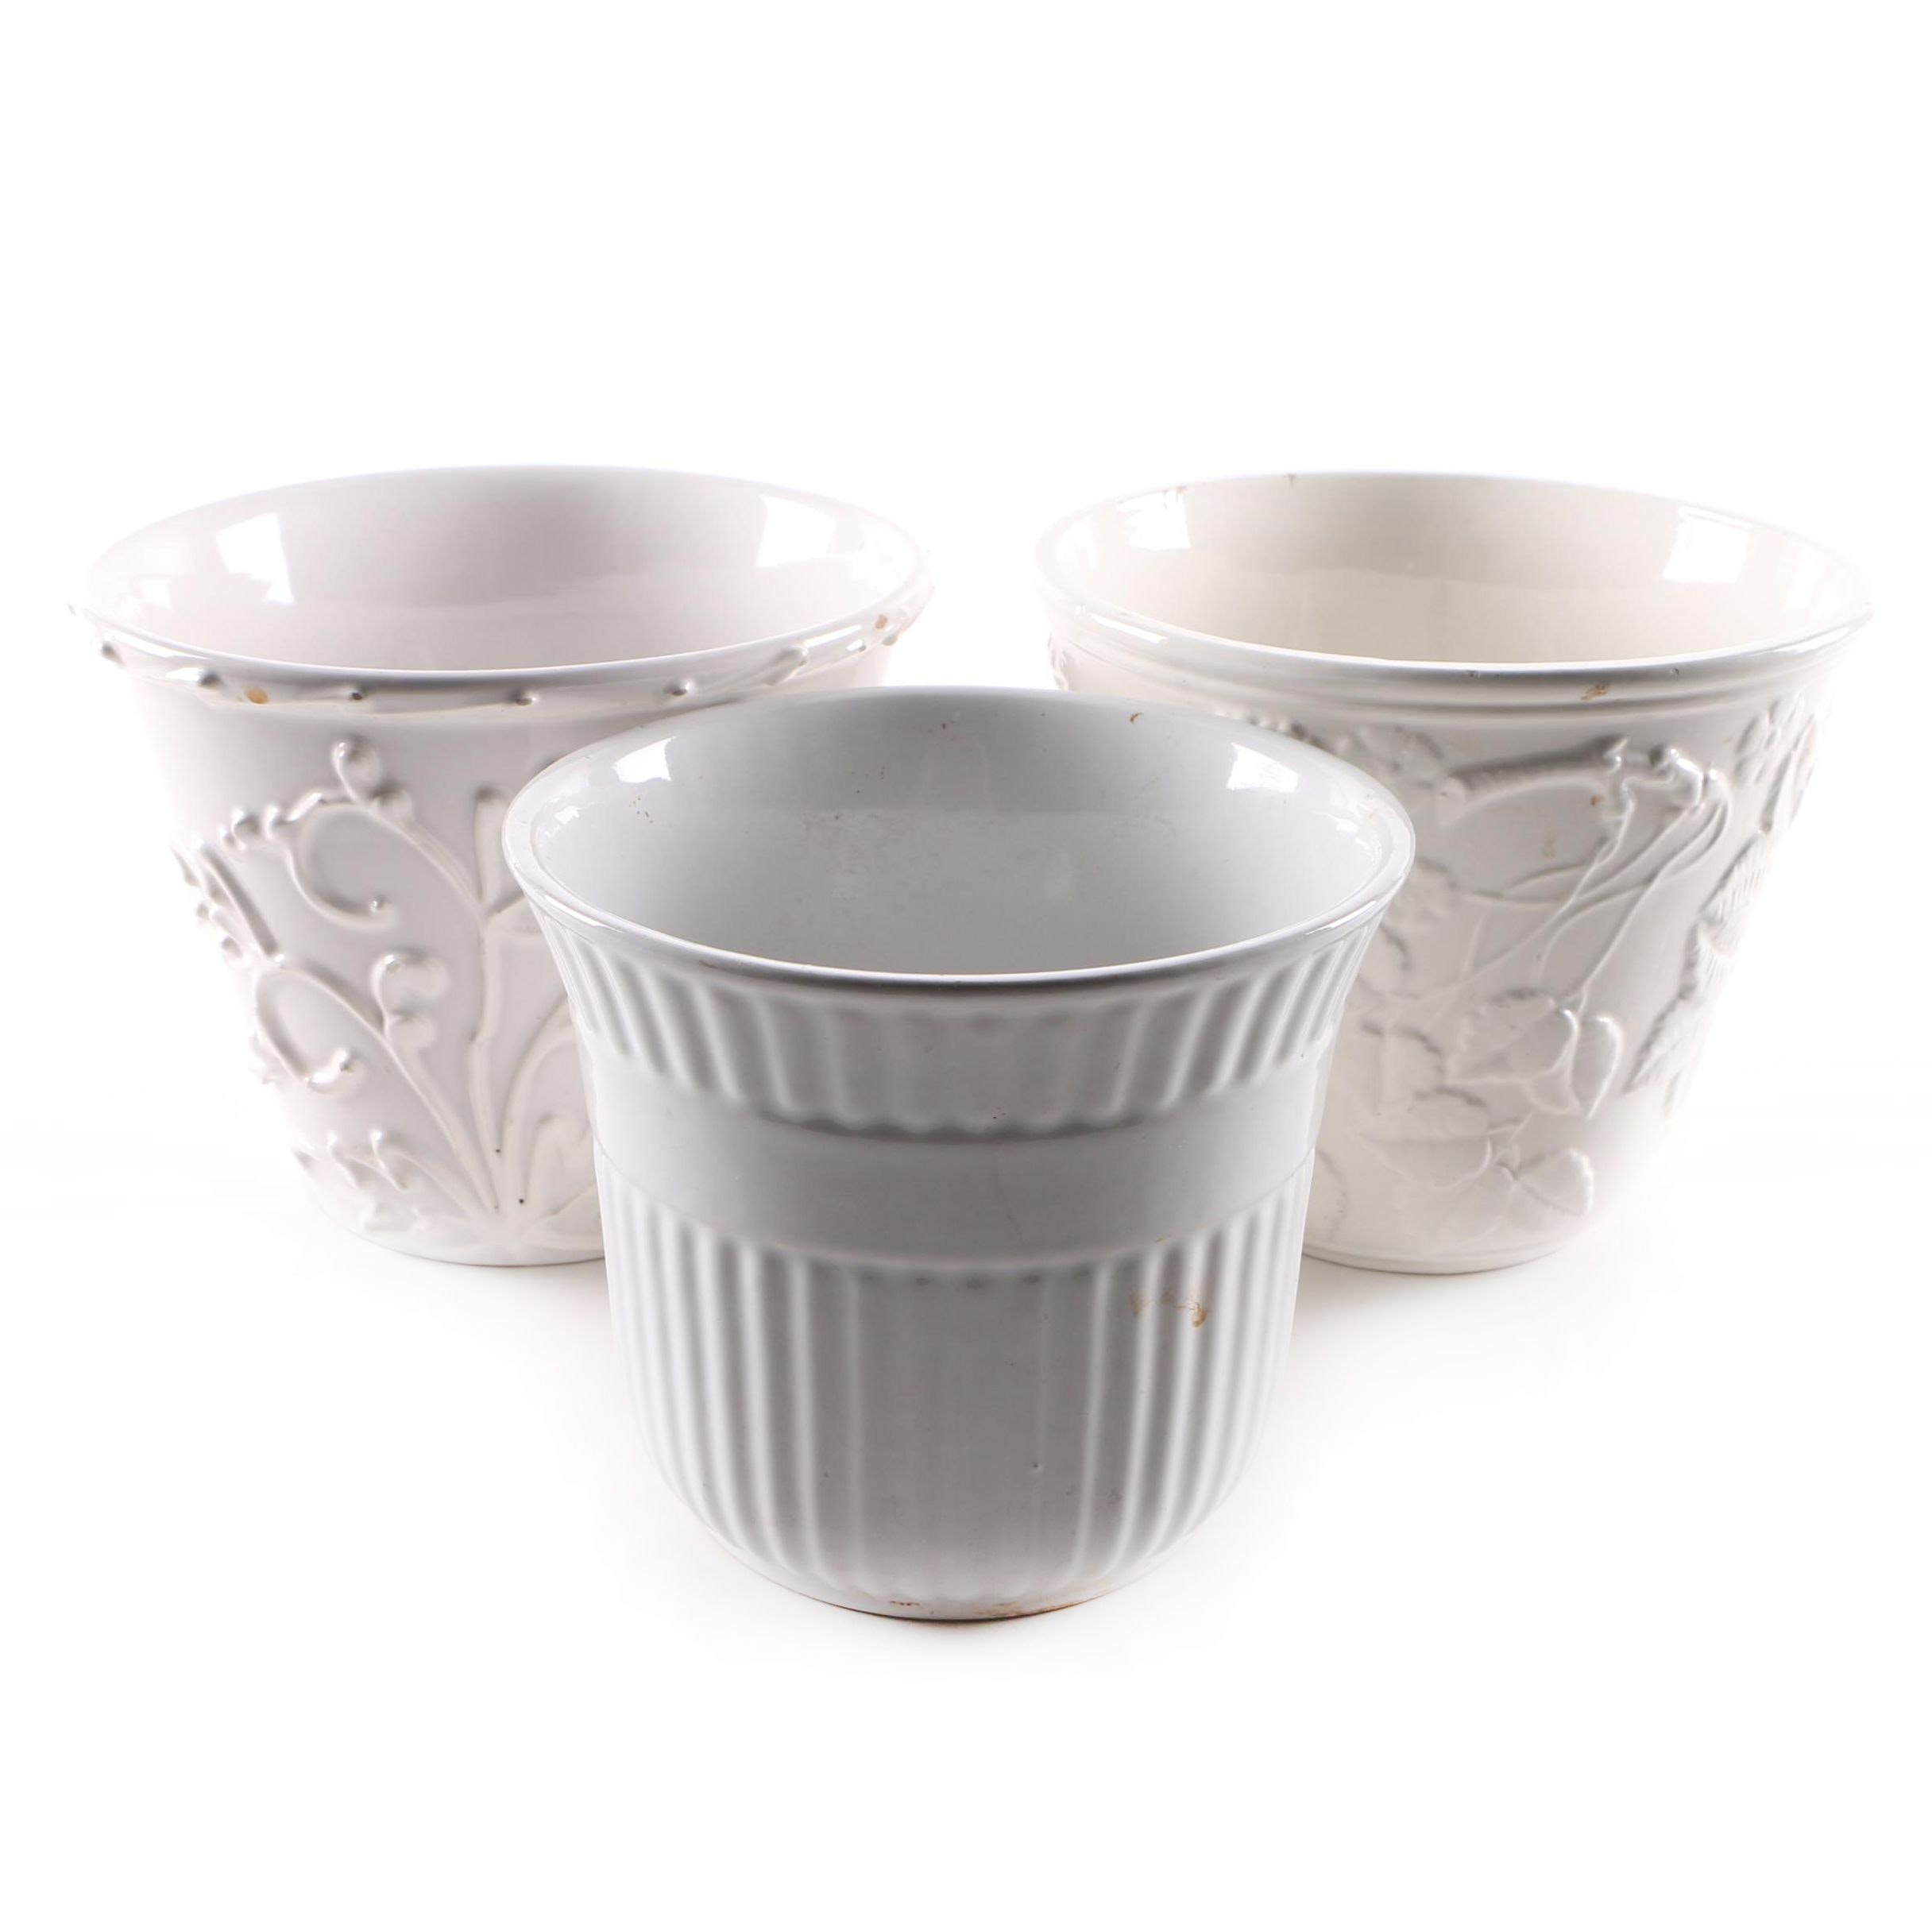 German and Italian White Ceramic Planters